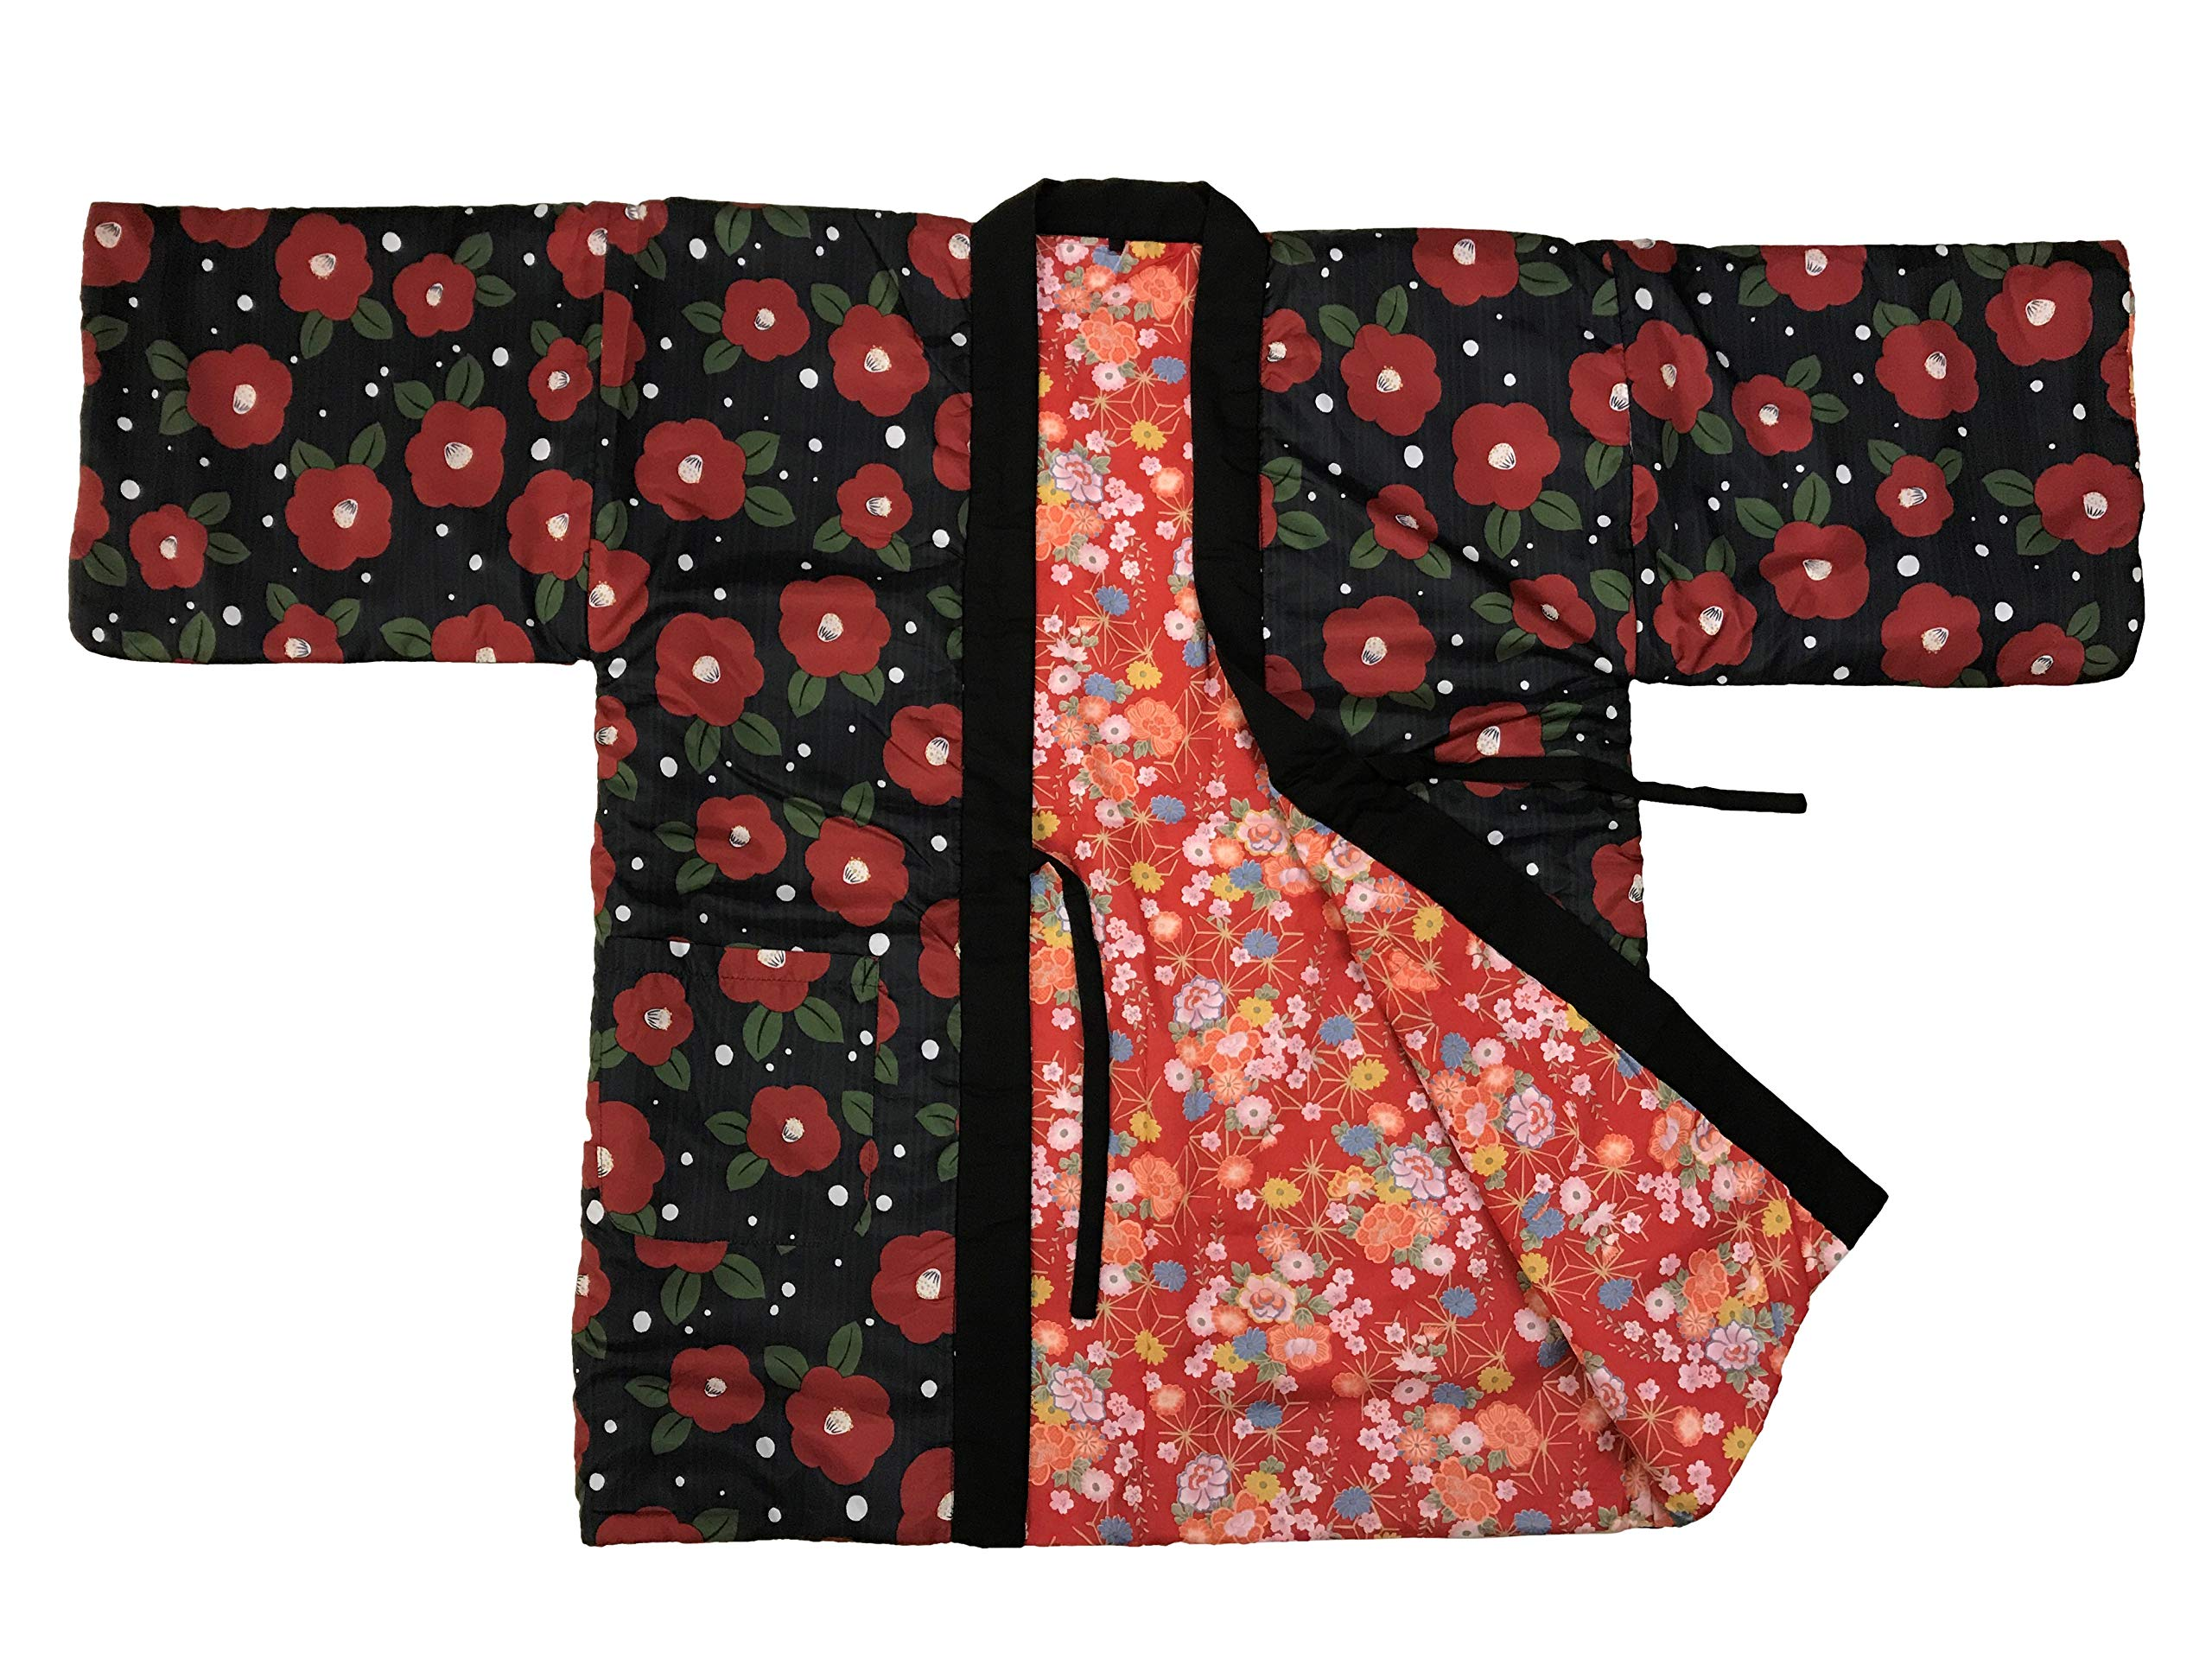 Edoten Japan Womens Hanten Pattern Reversible Hand wash Possible Polyester Tsubaki L